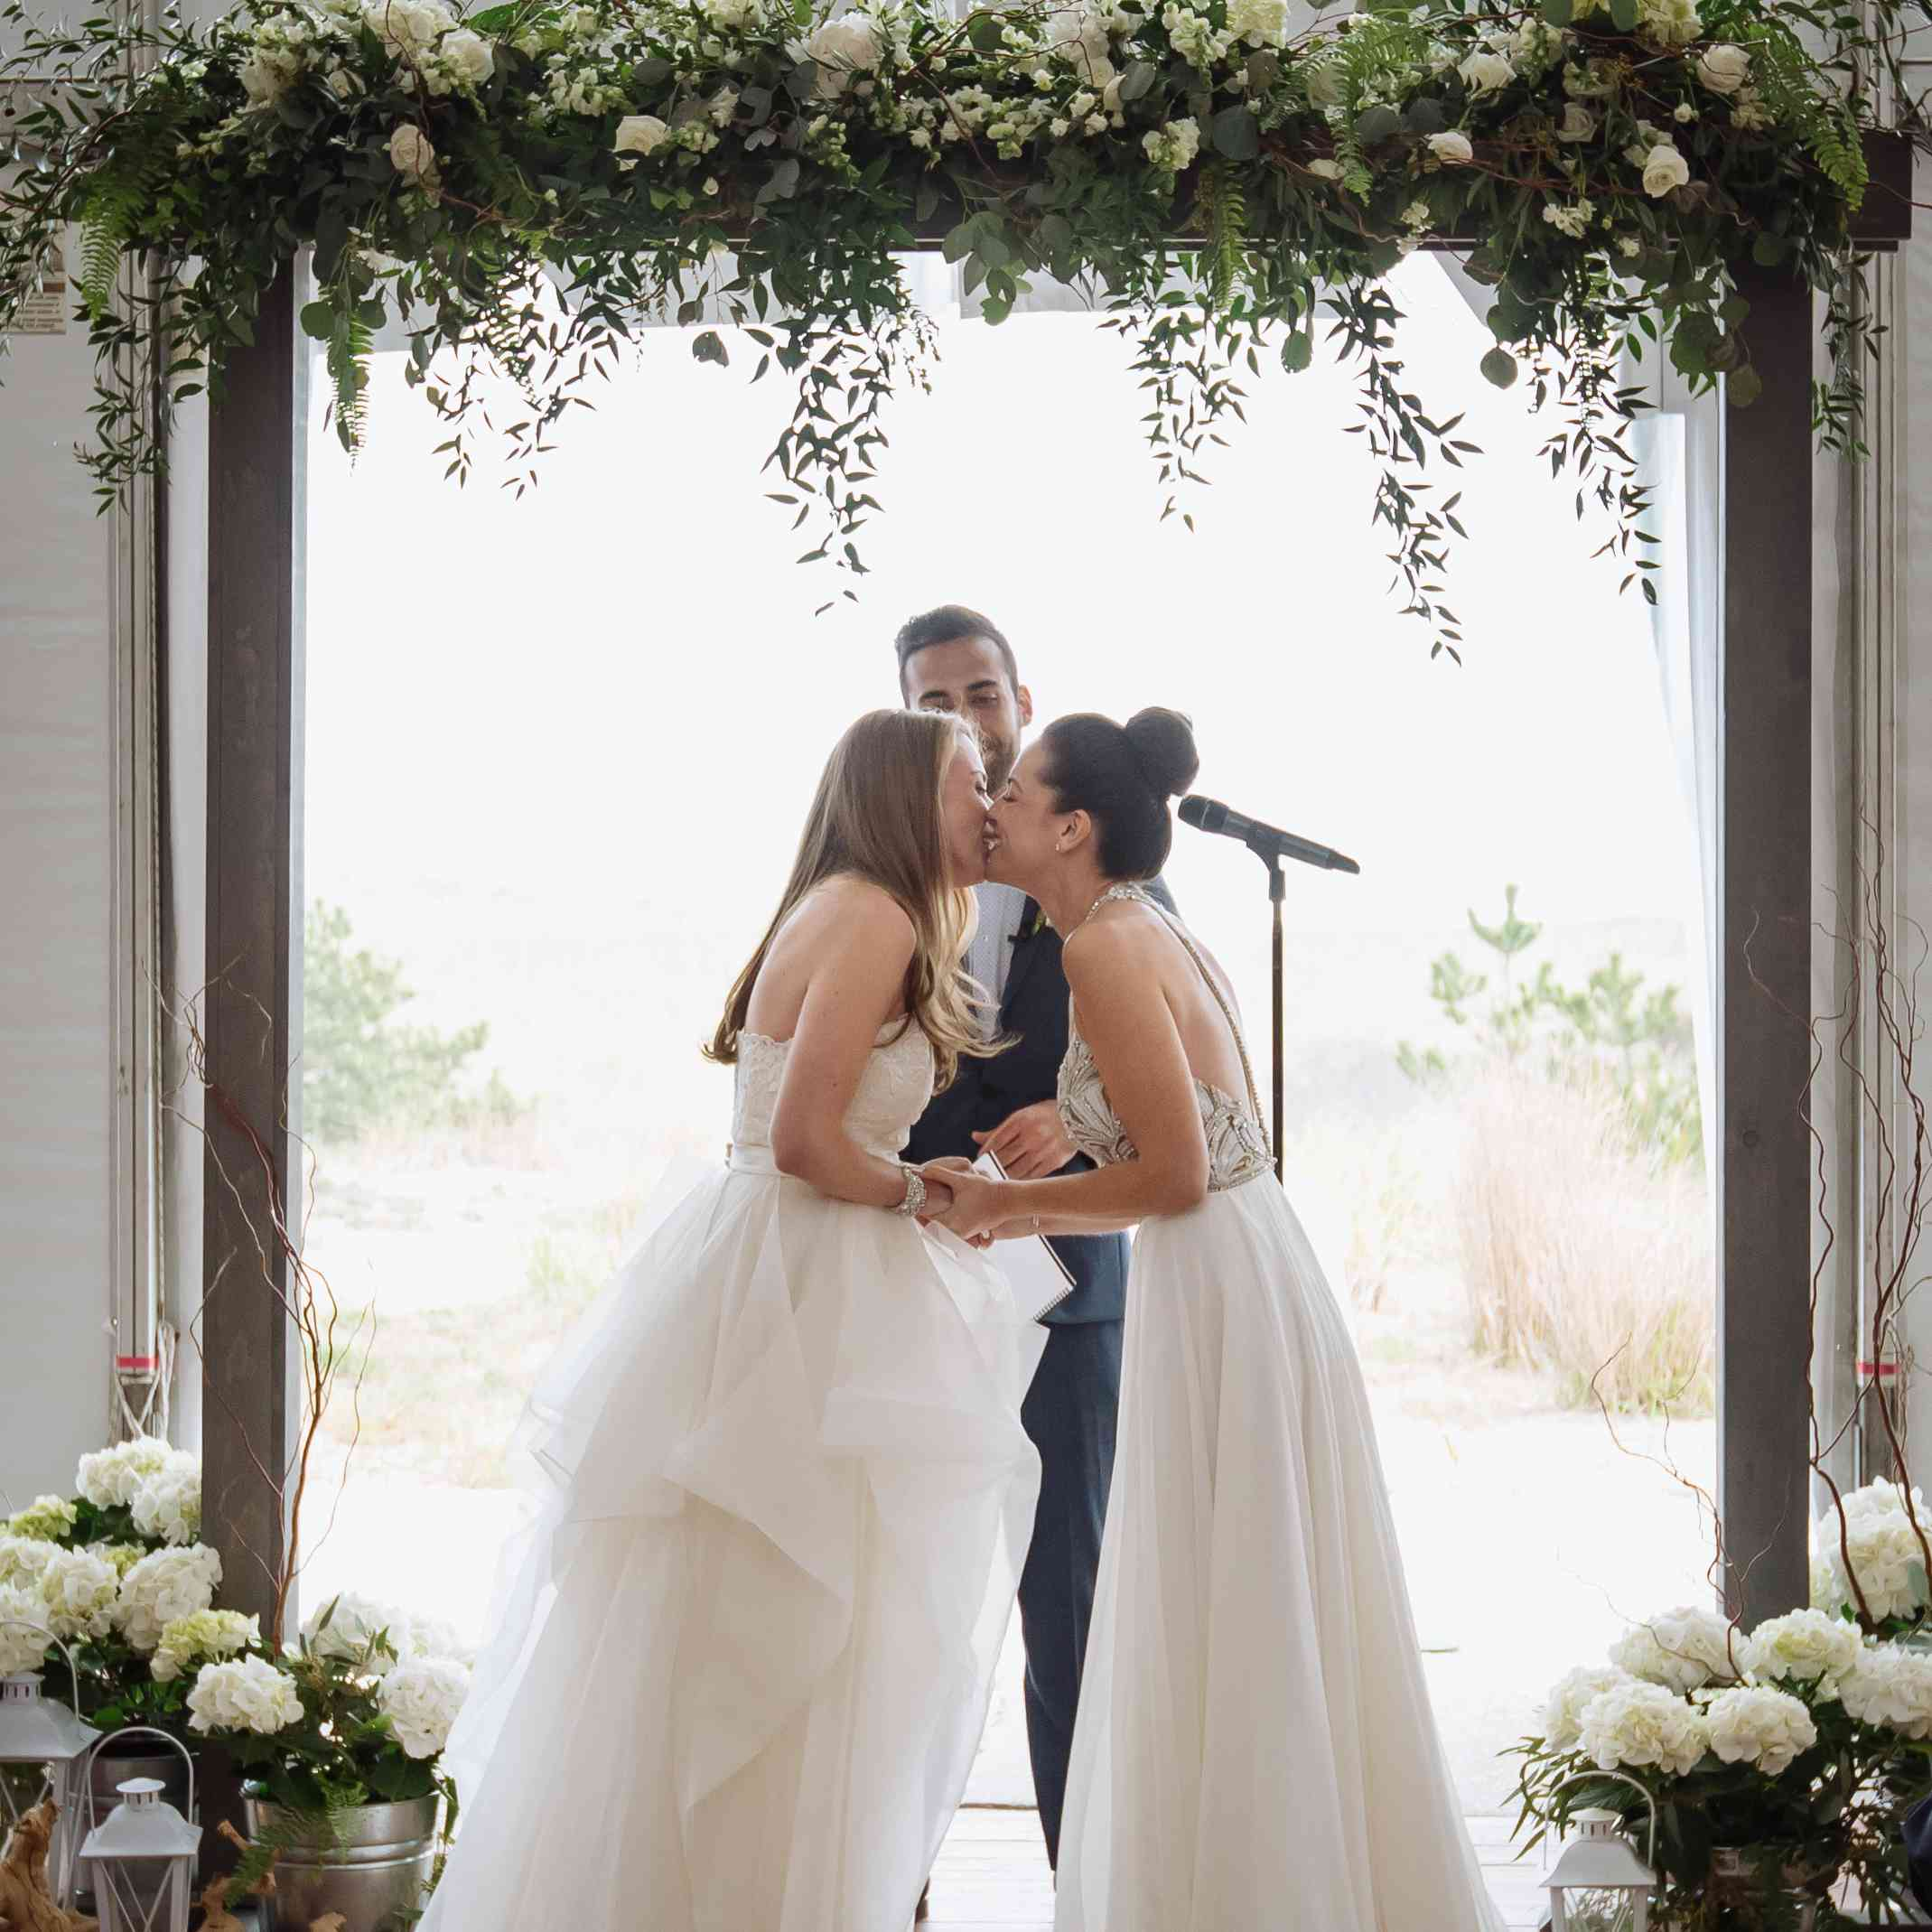 Brides' First Kiss